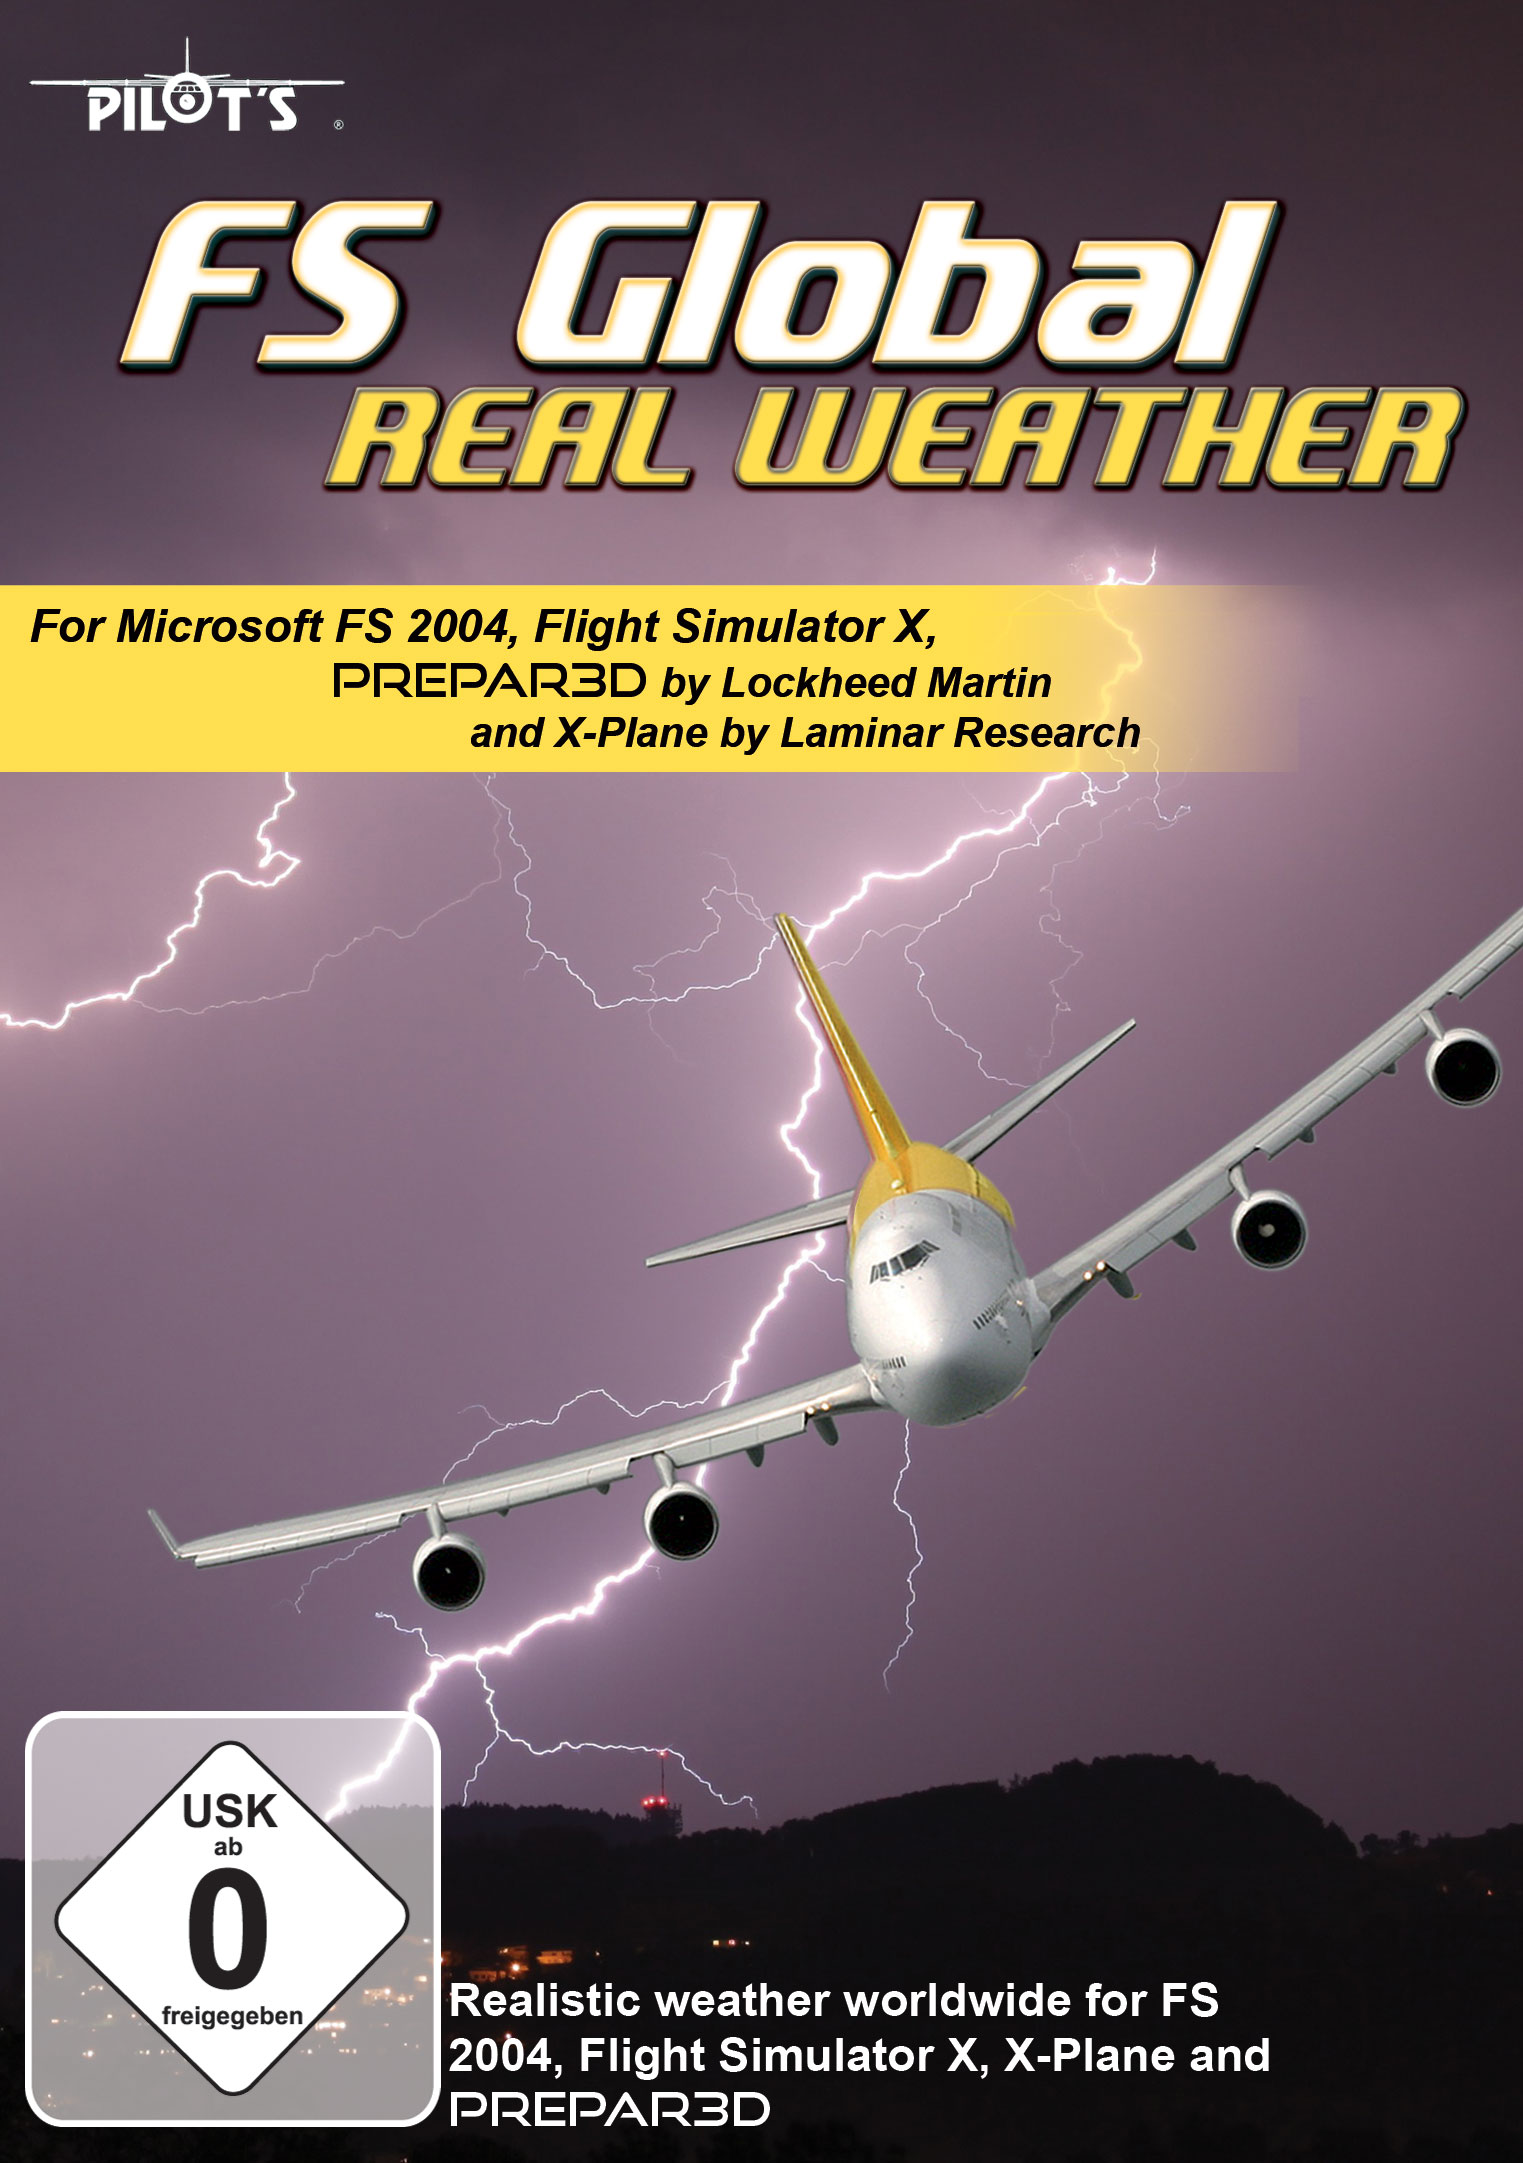 Locomotives For Sale >> FS Global Real Weather (FS9/FSX/FSX:SE/P3Dv1-3/XP10) | Aerosoft Shop